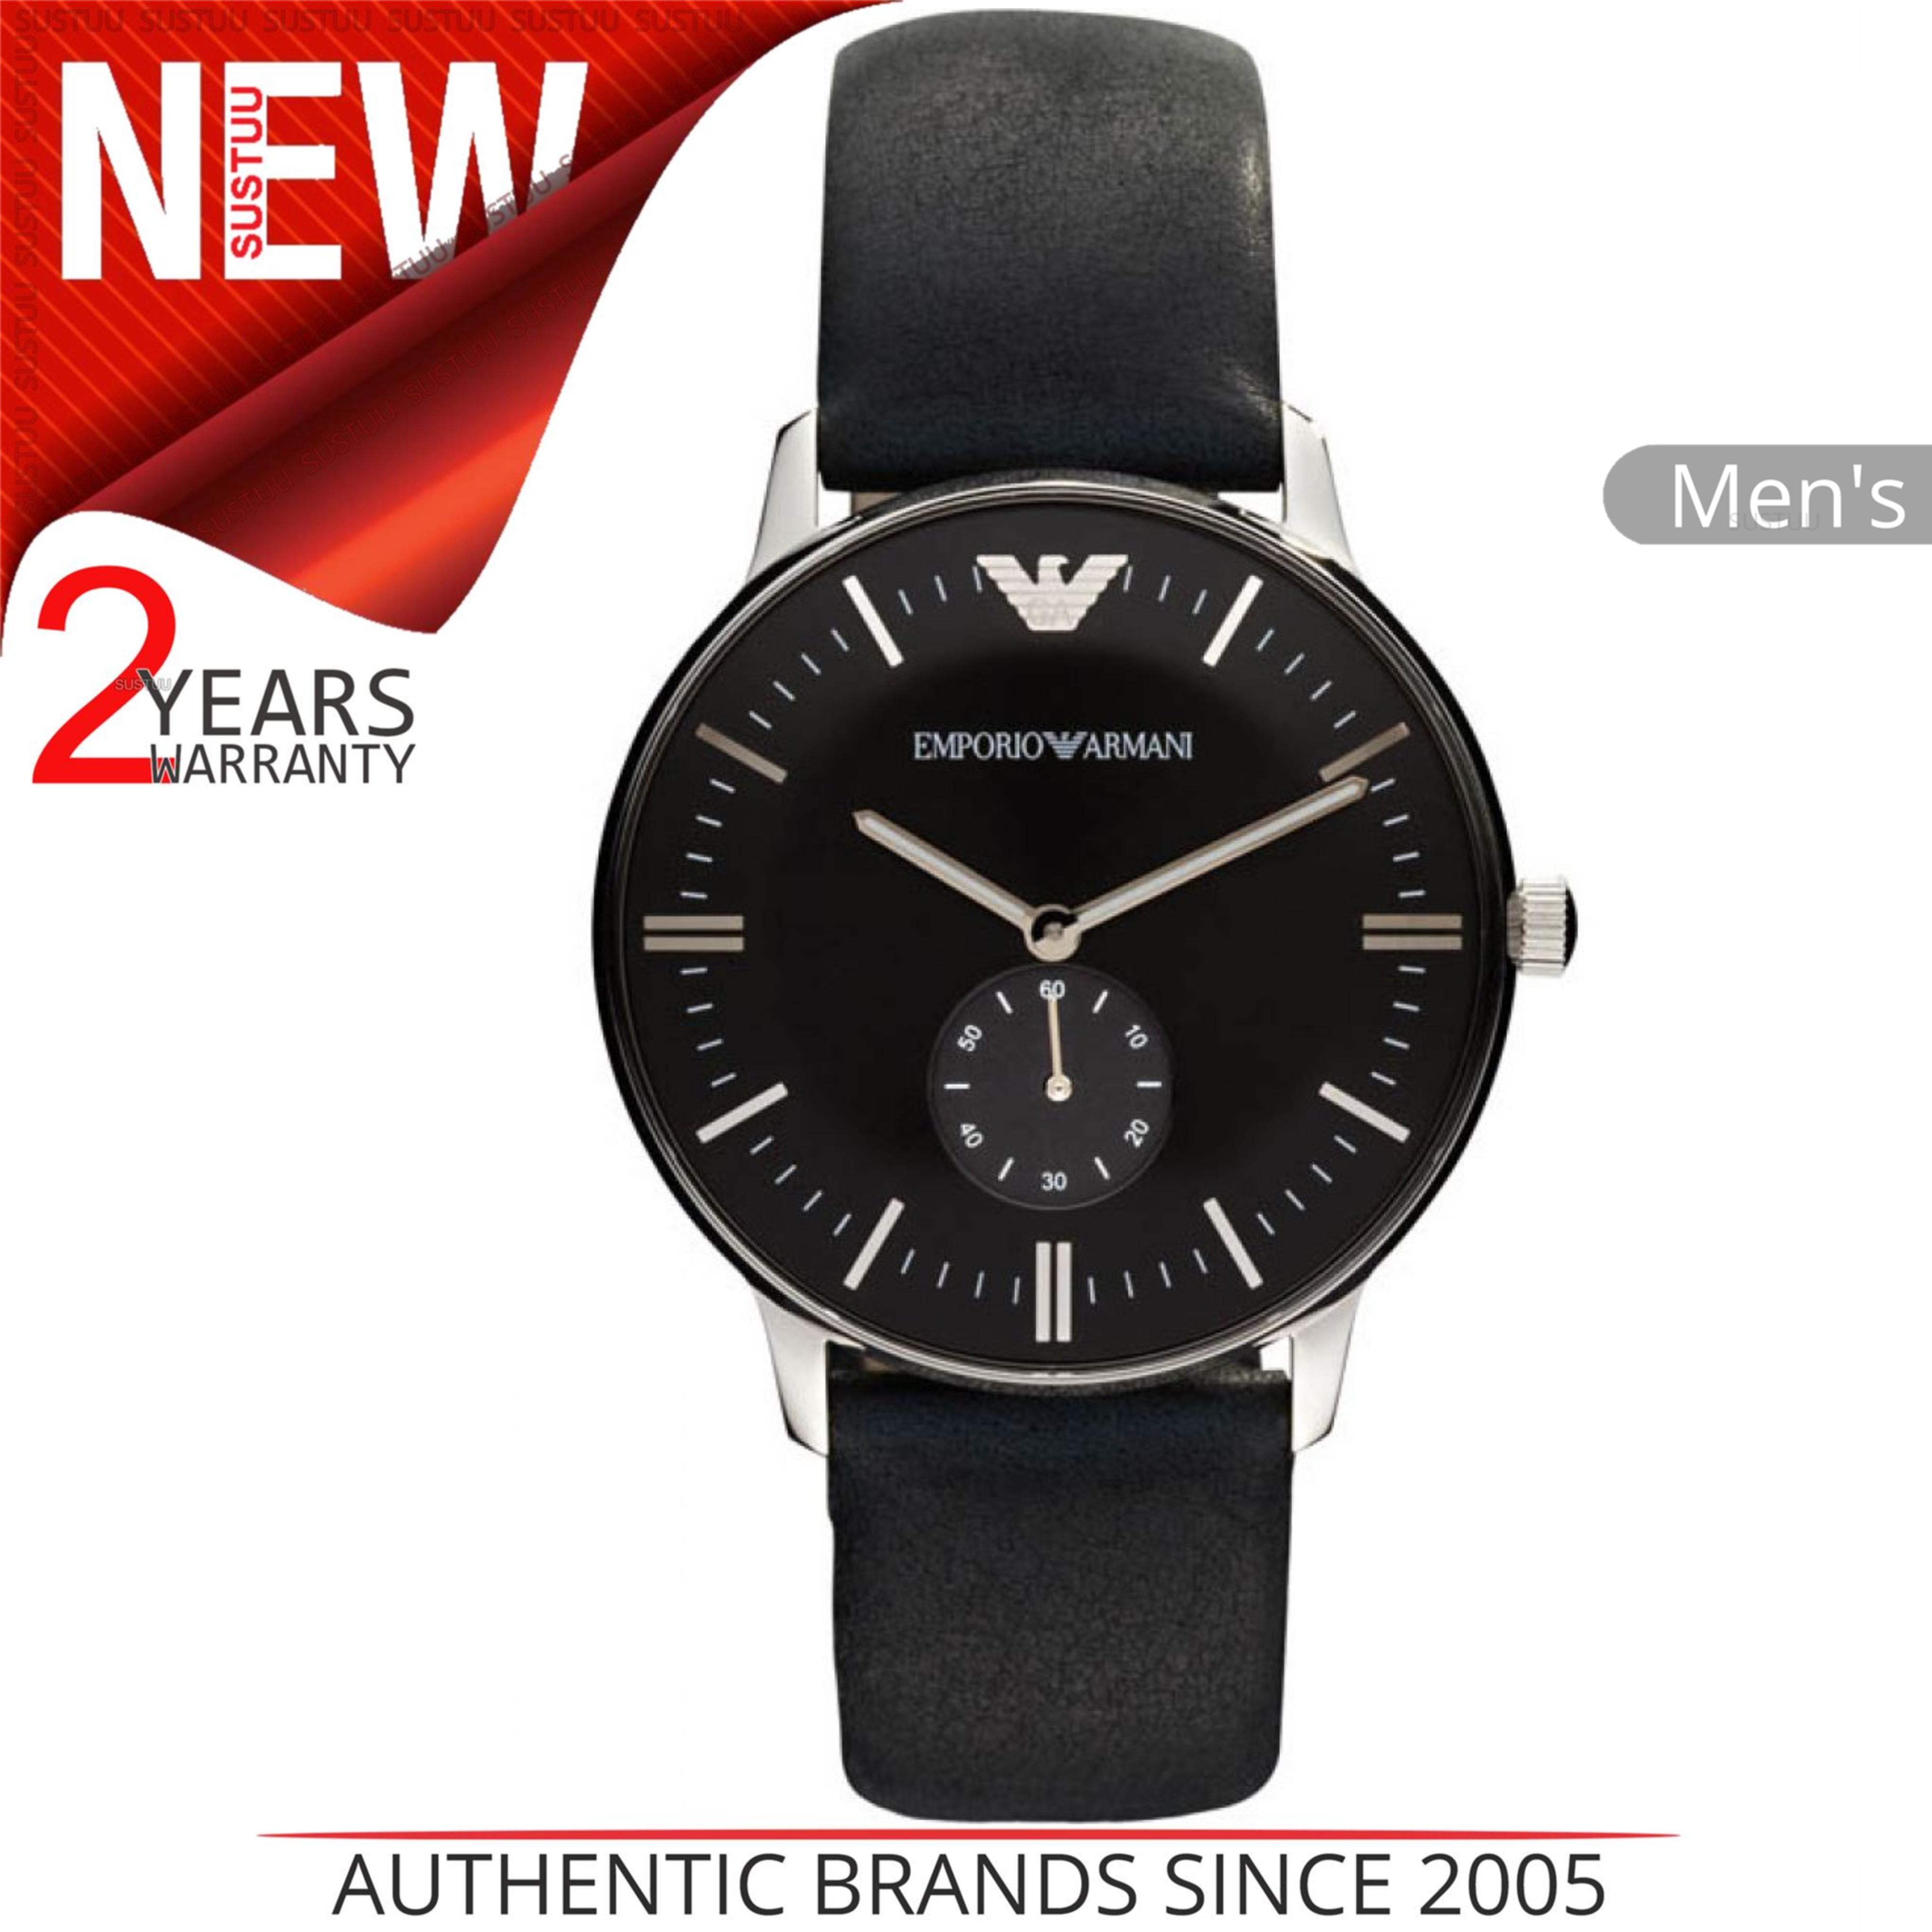 c358db4c9aa29 Sentinel Emporio Armani Classic Men s Watch│Black Chronograph Dial│Leather  Strap│AR0382